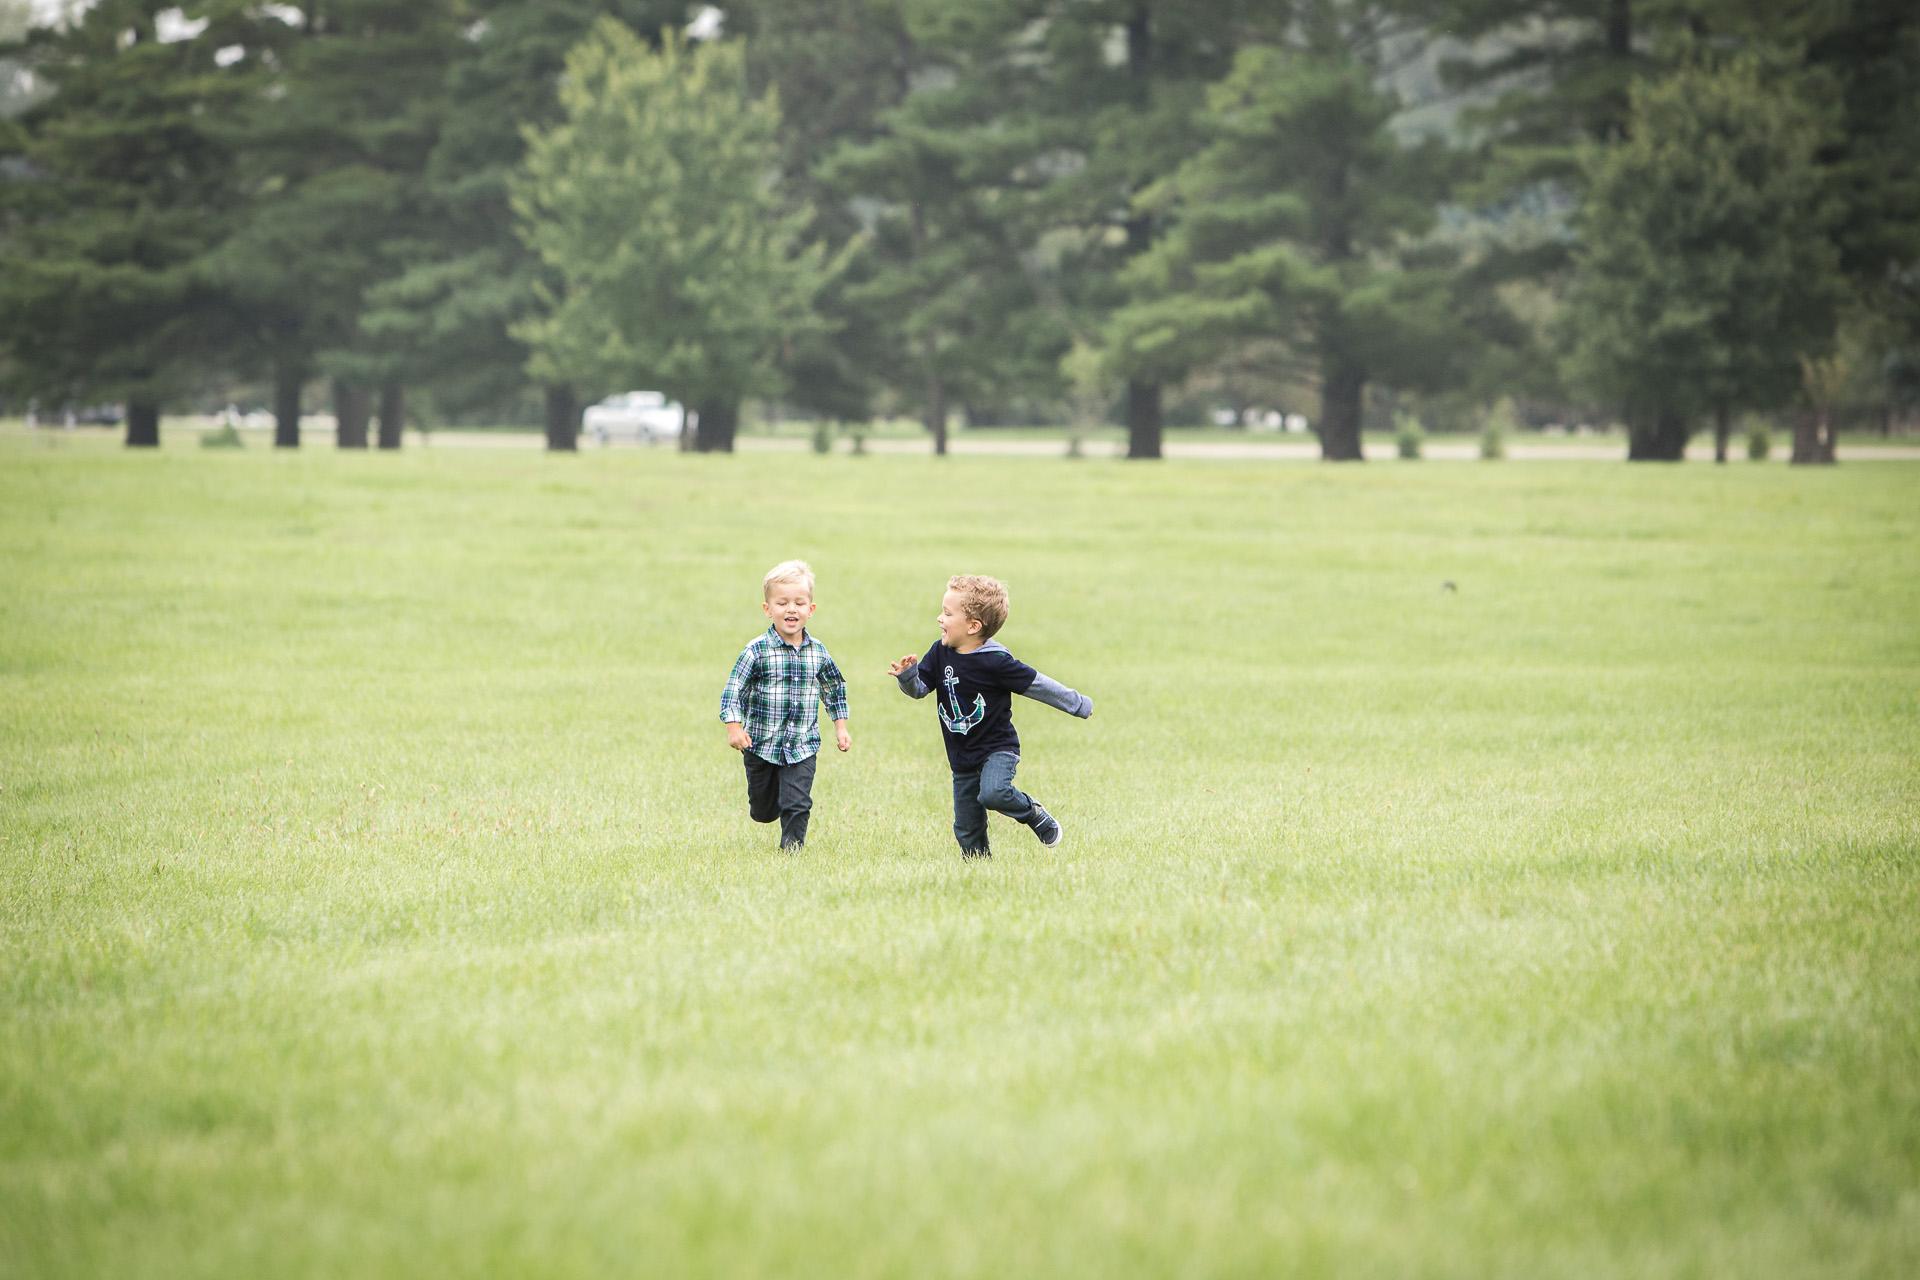 child-photographer-des-moines.jpg